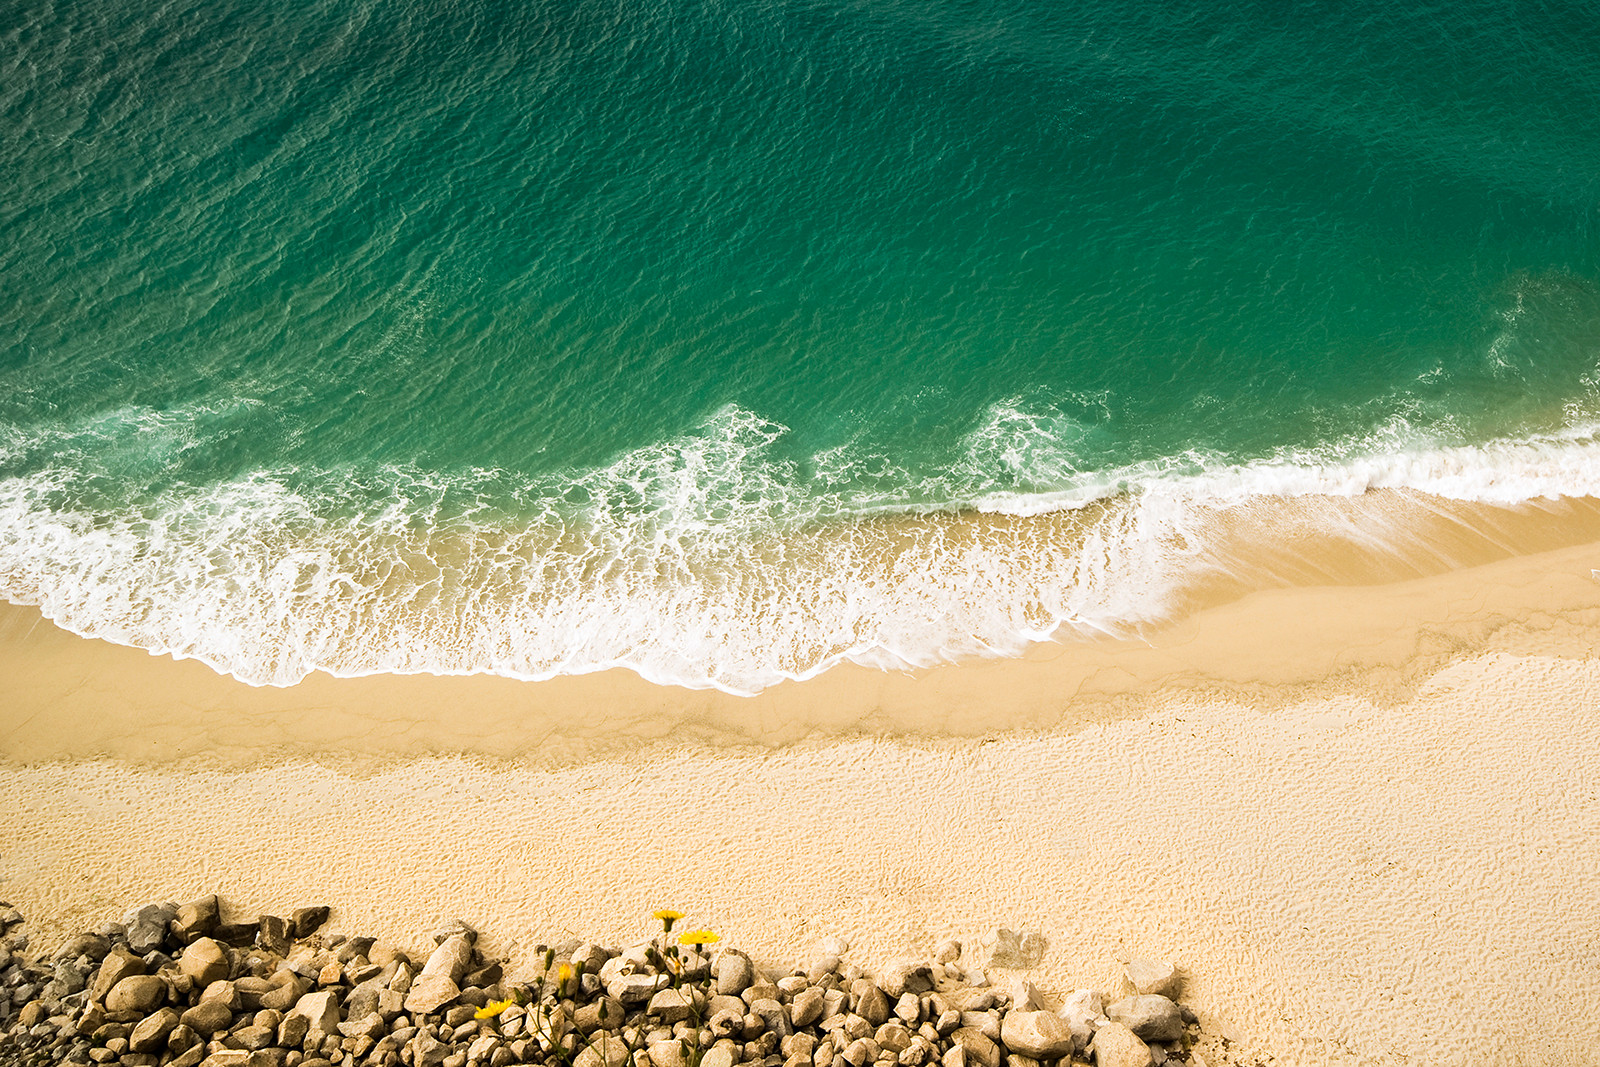 PDI - The Beach by Angela Van Wel (9 marks)